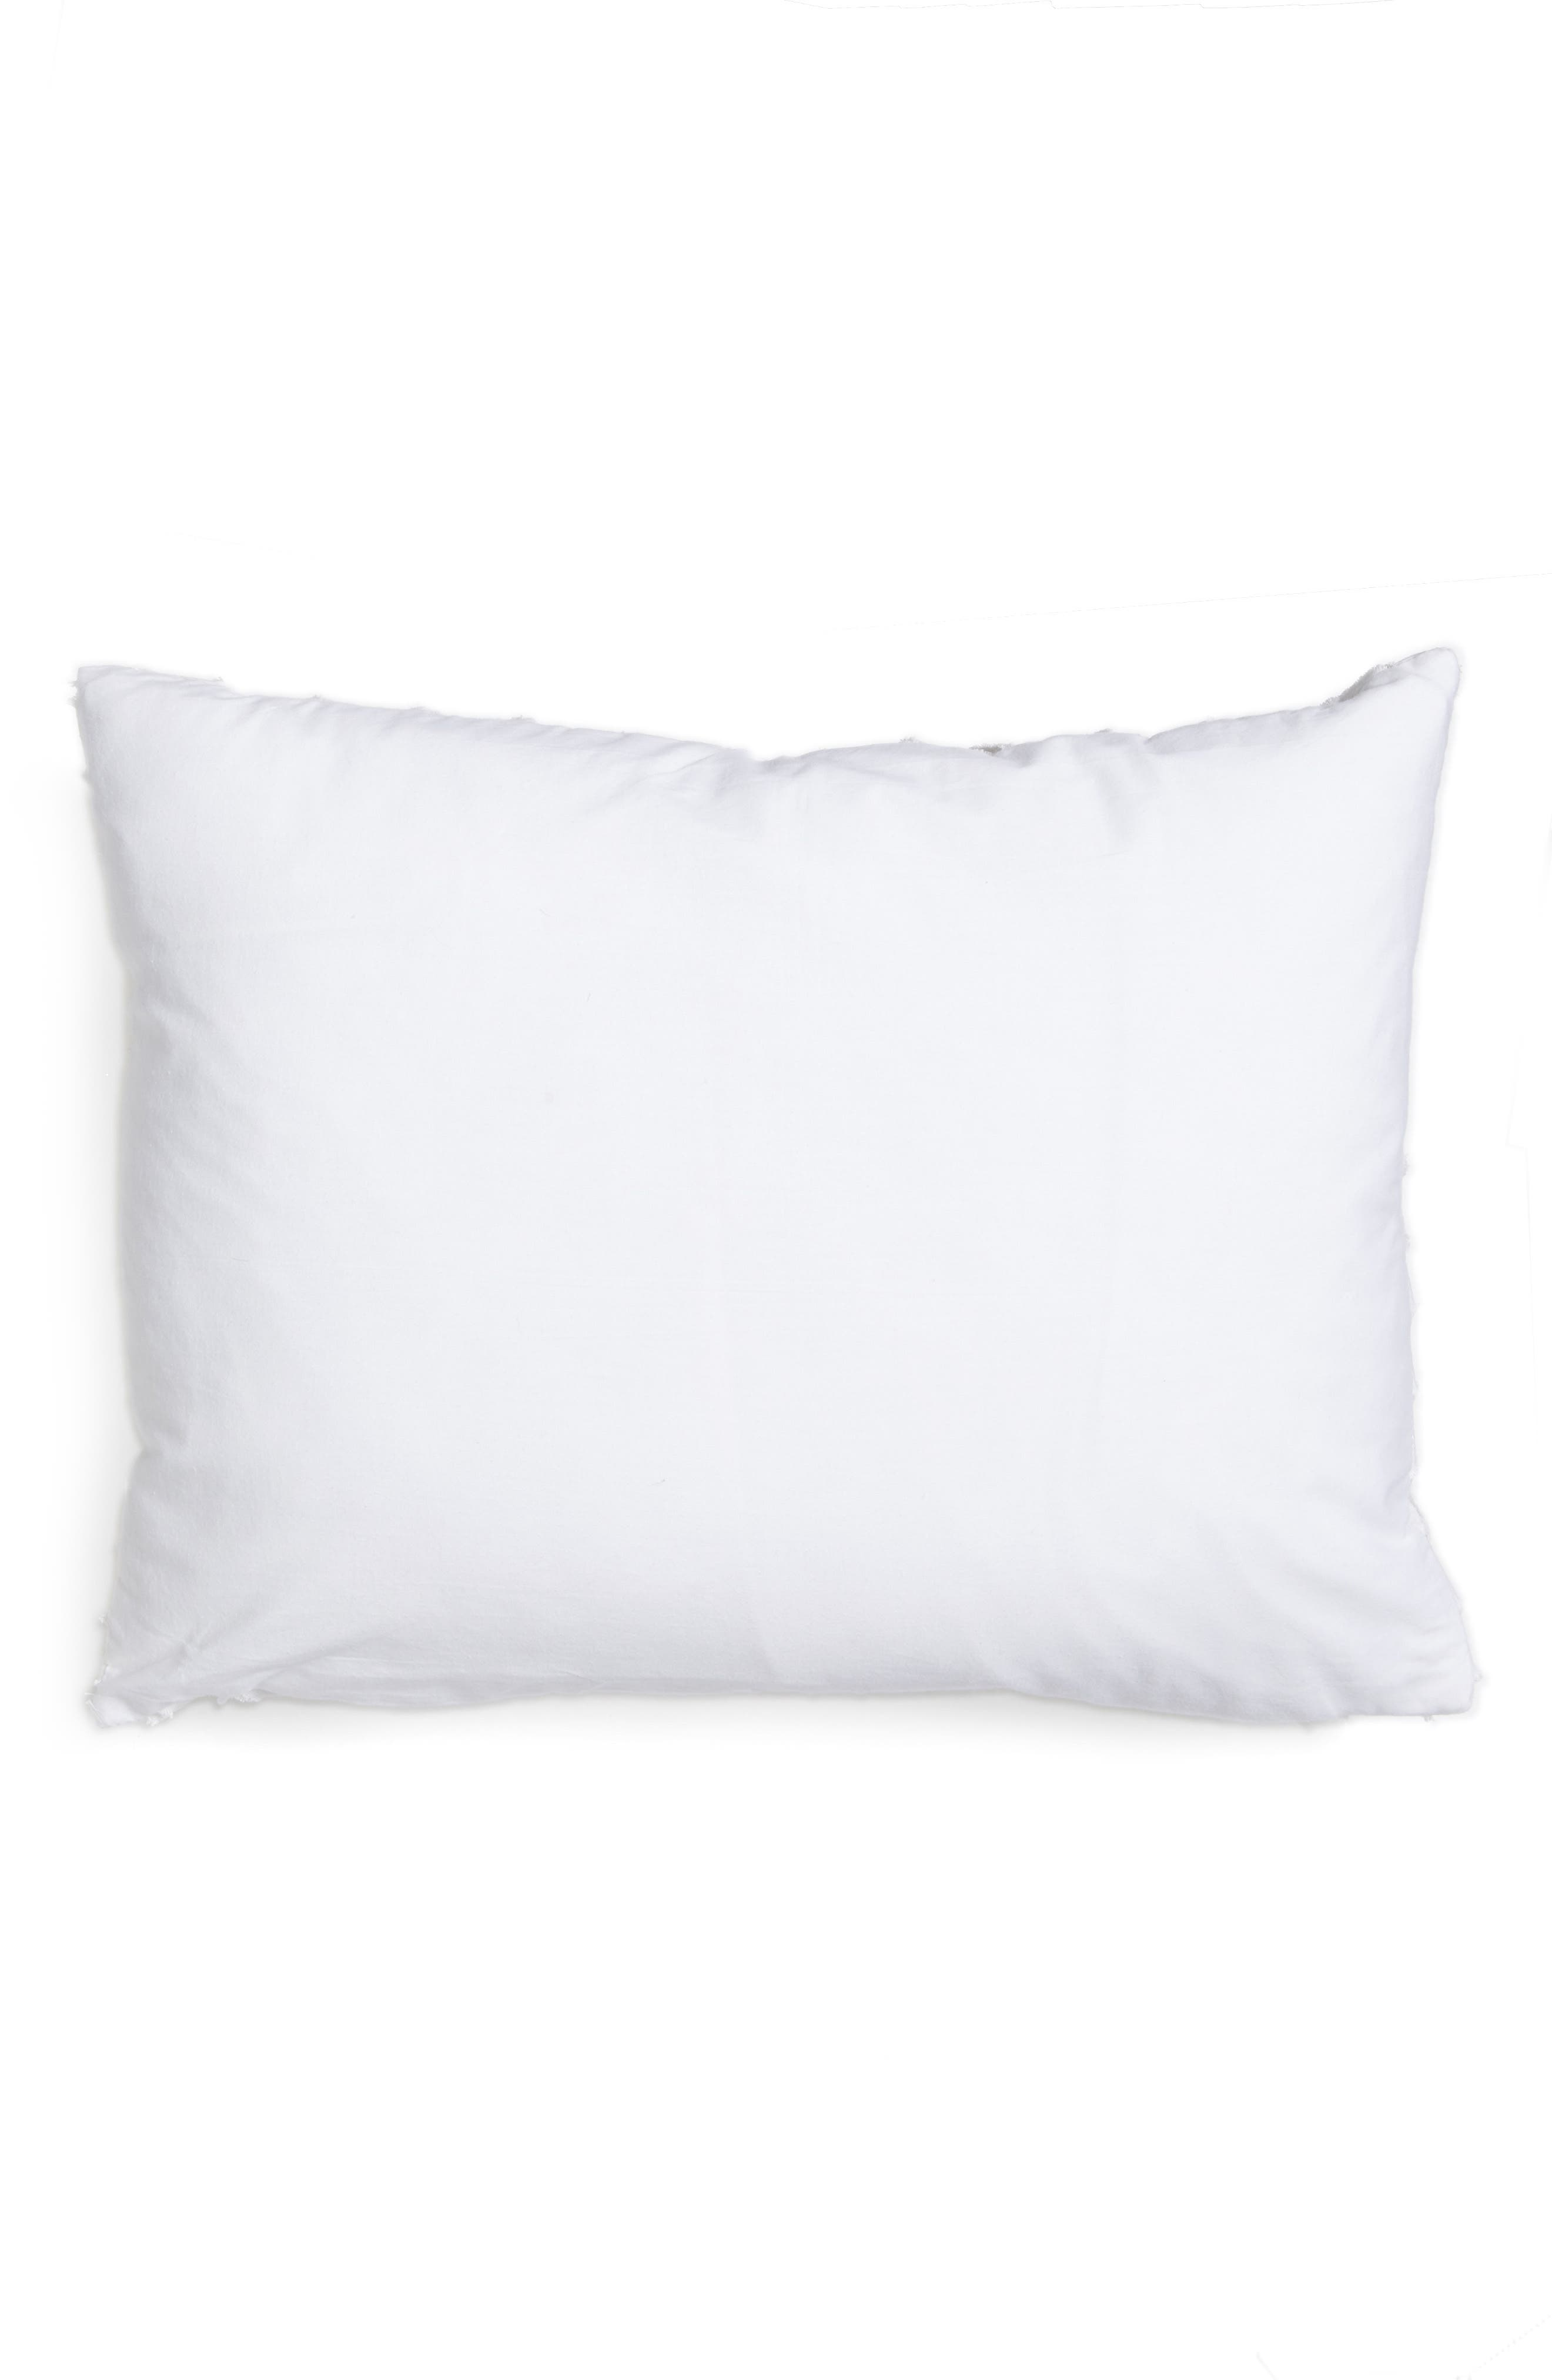 Alexandria Accent Pillow,                             Alternate thumbnail 2, color,                             100